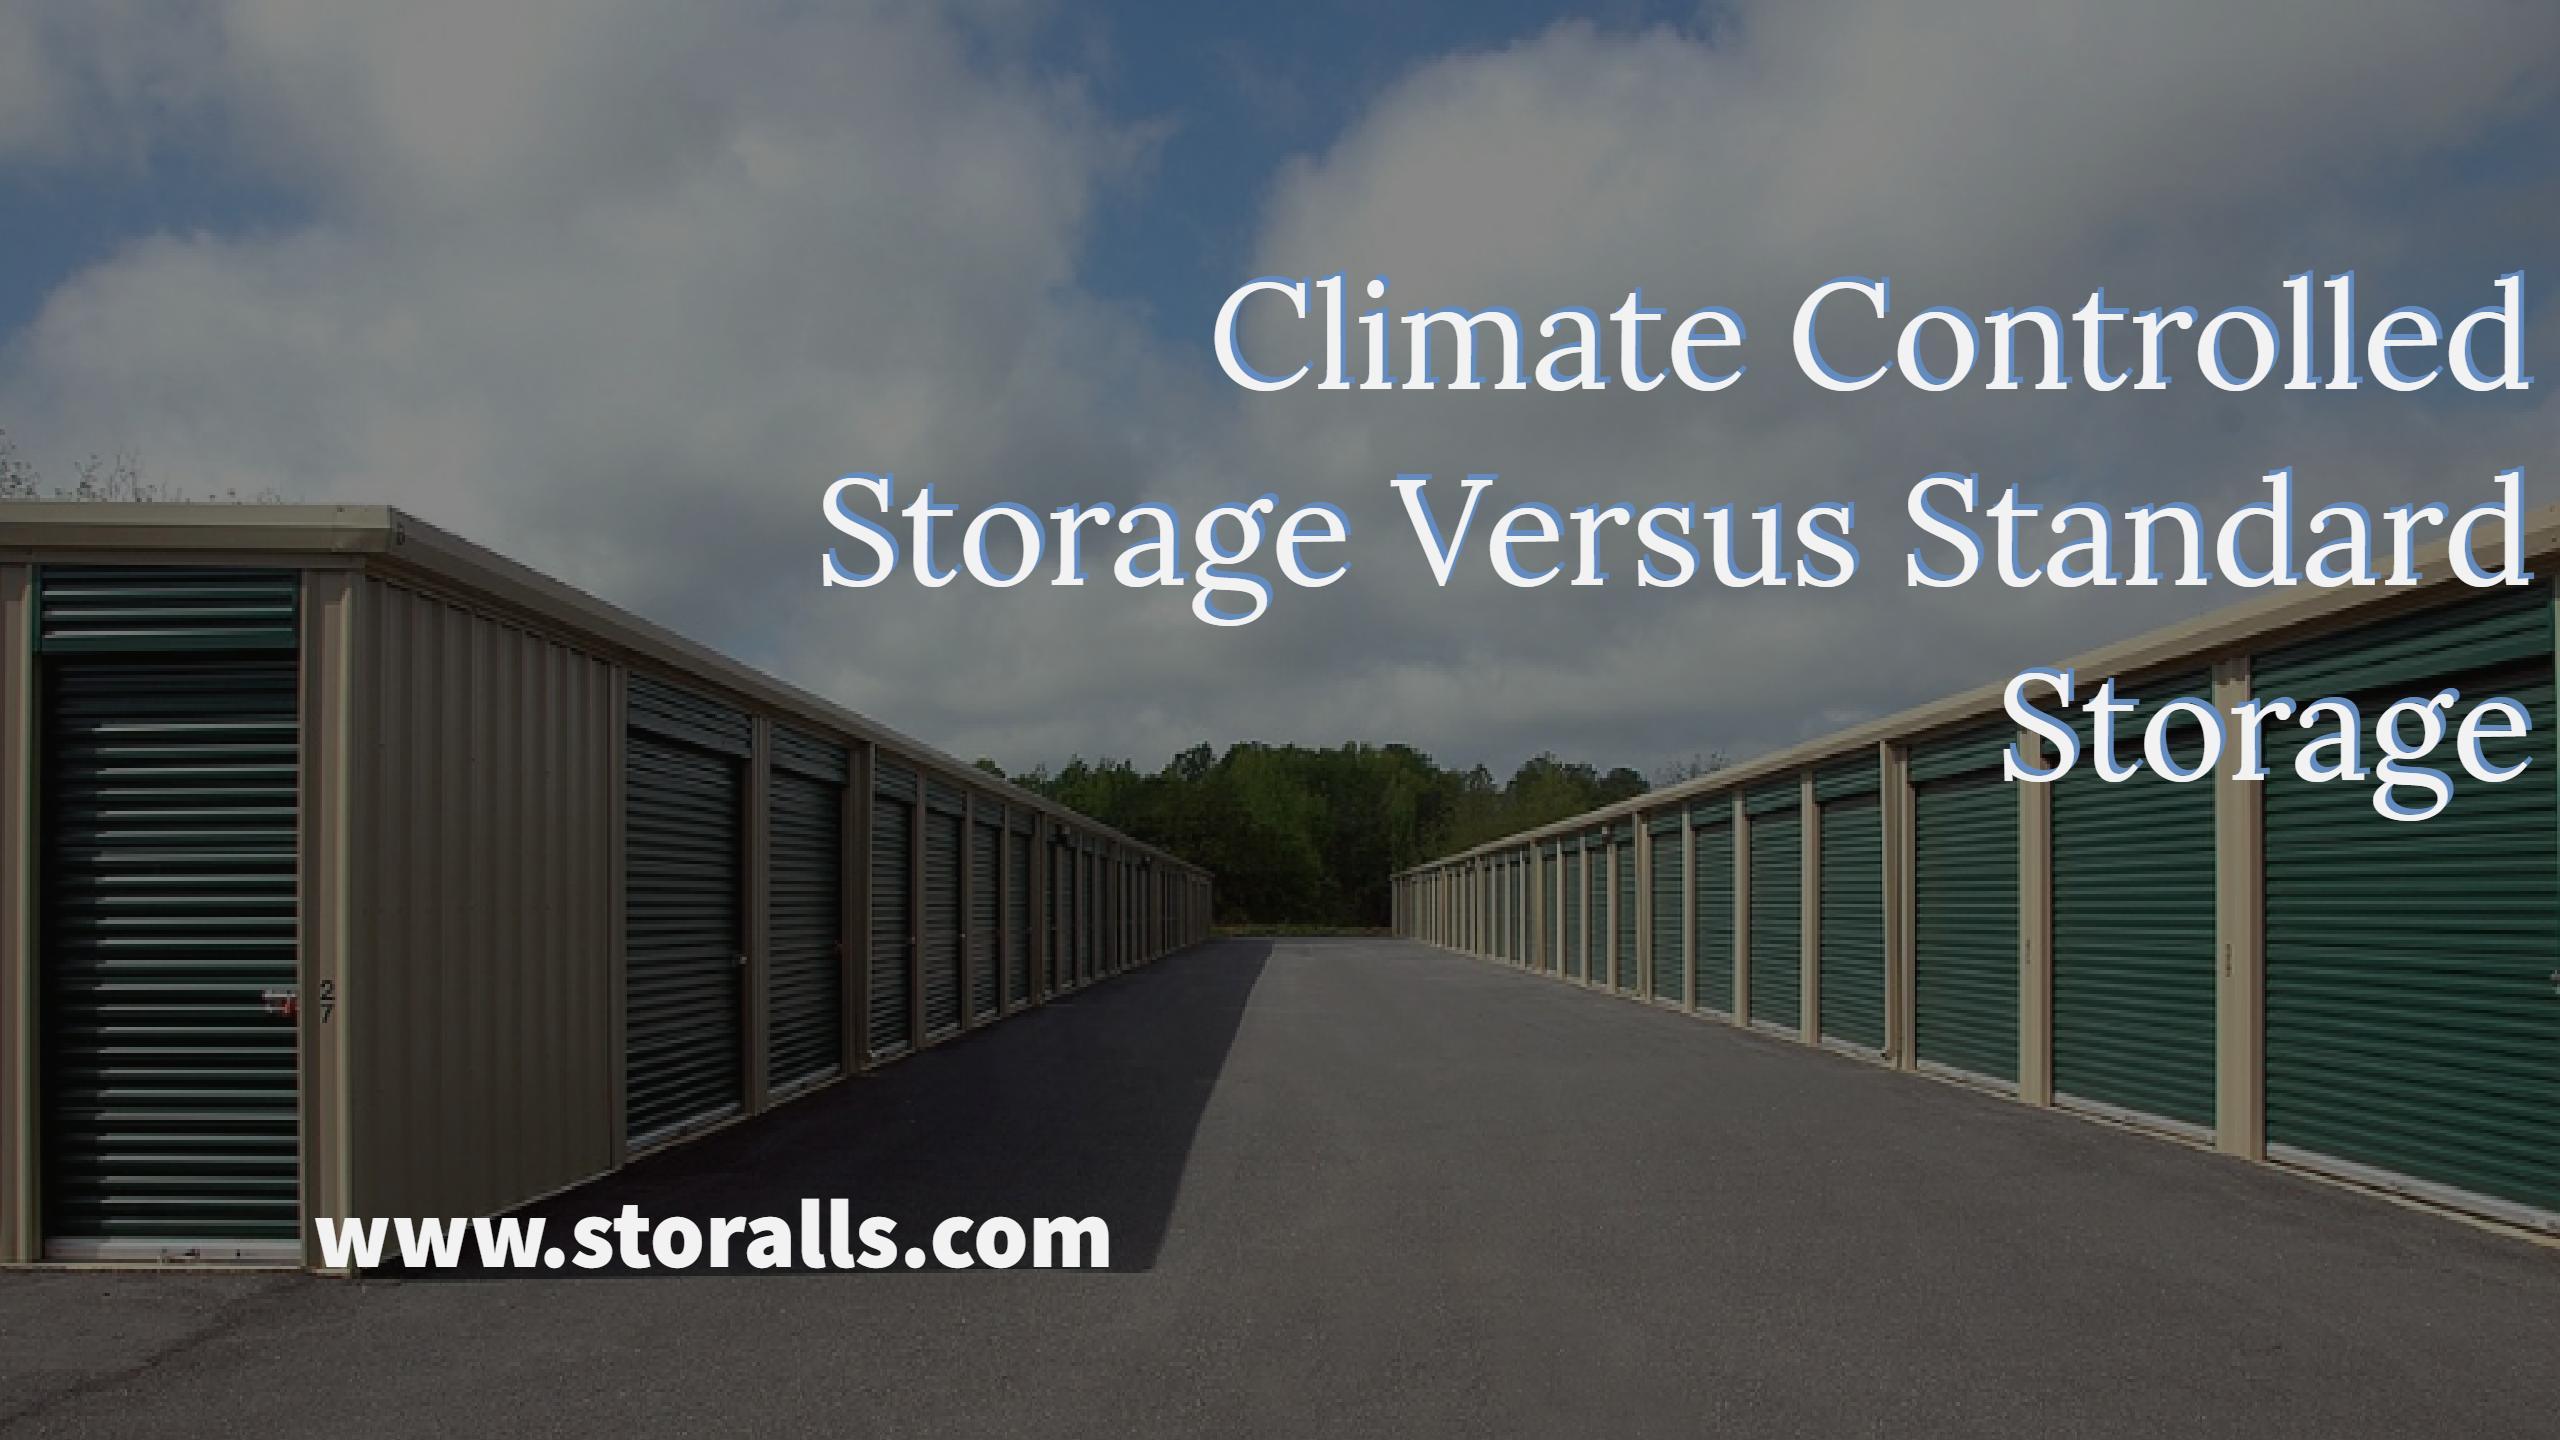 Climate Controlled Storage Versus Standard Storage